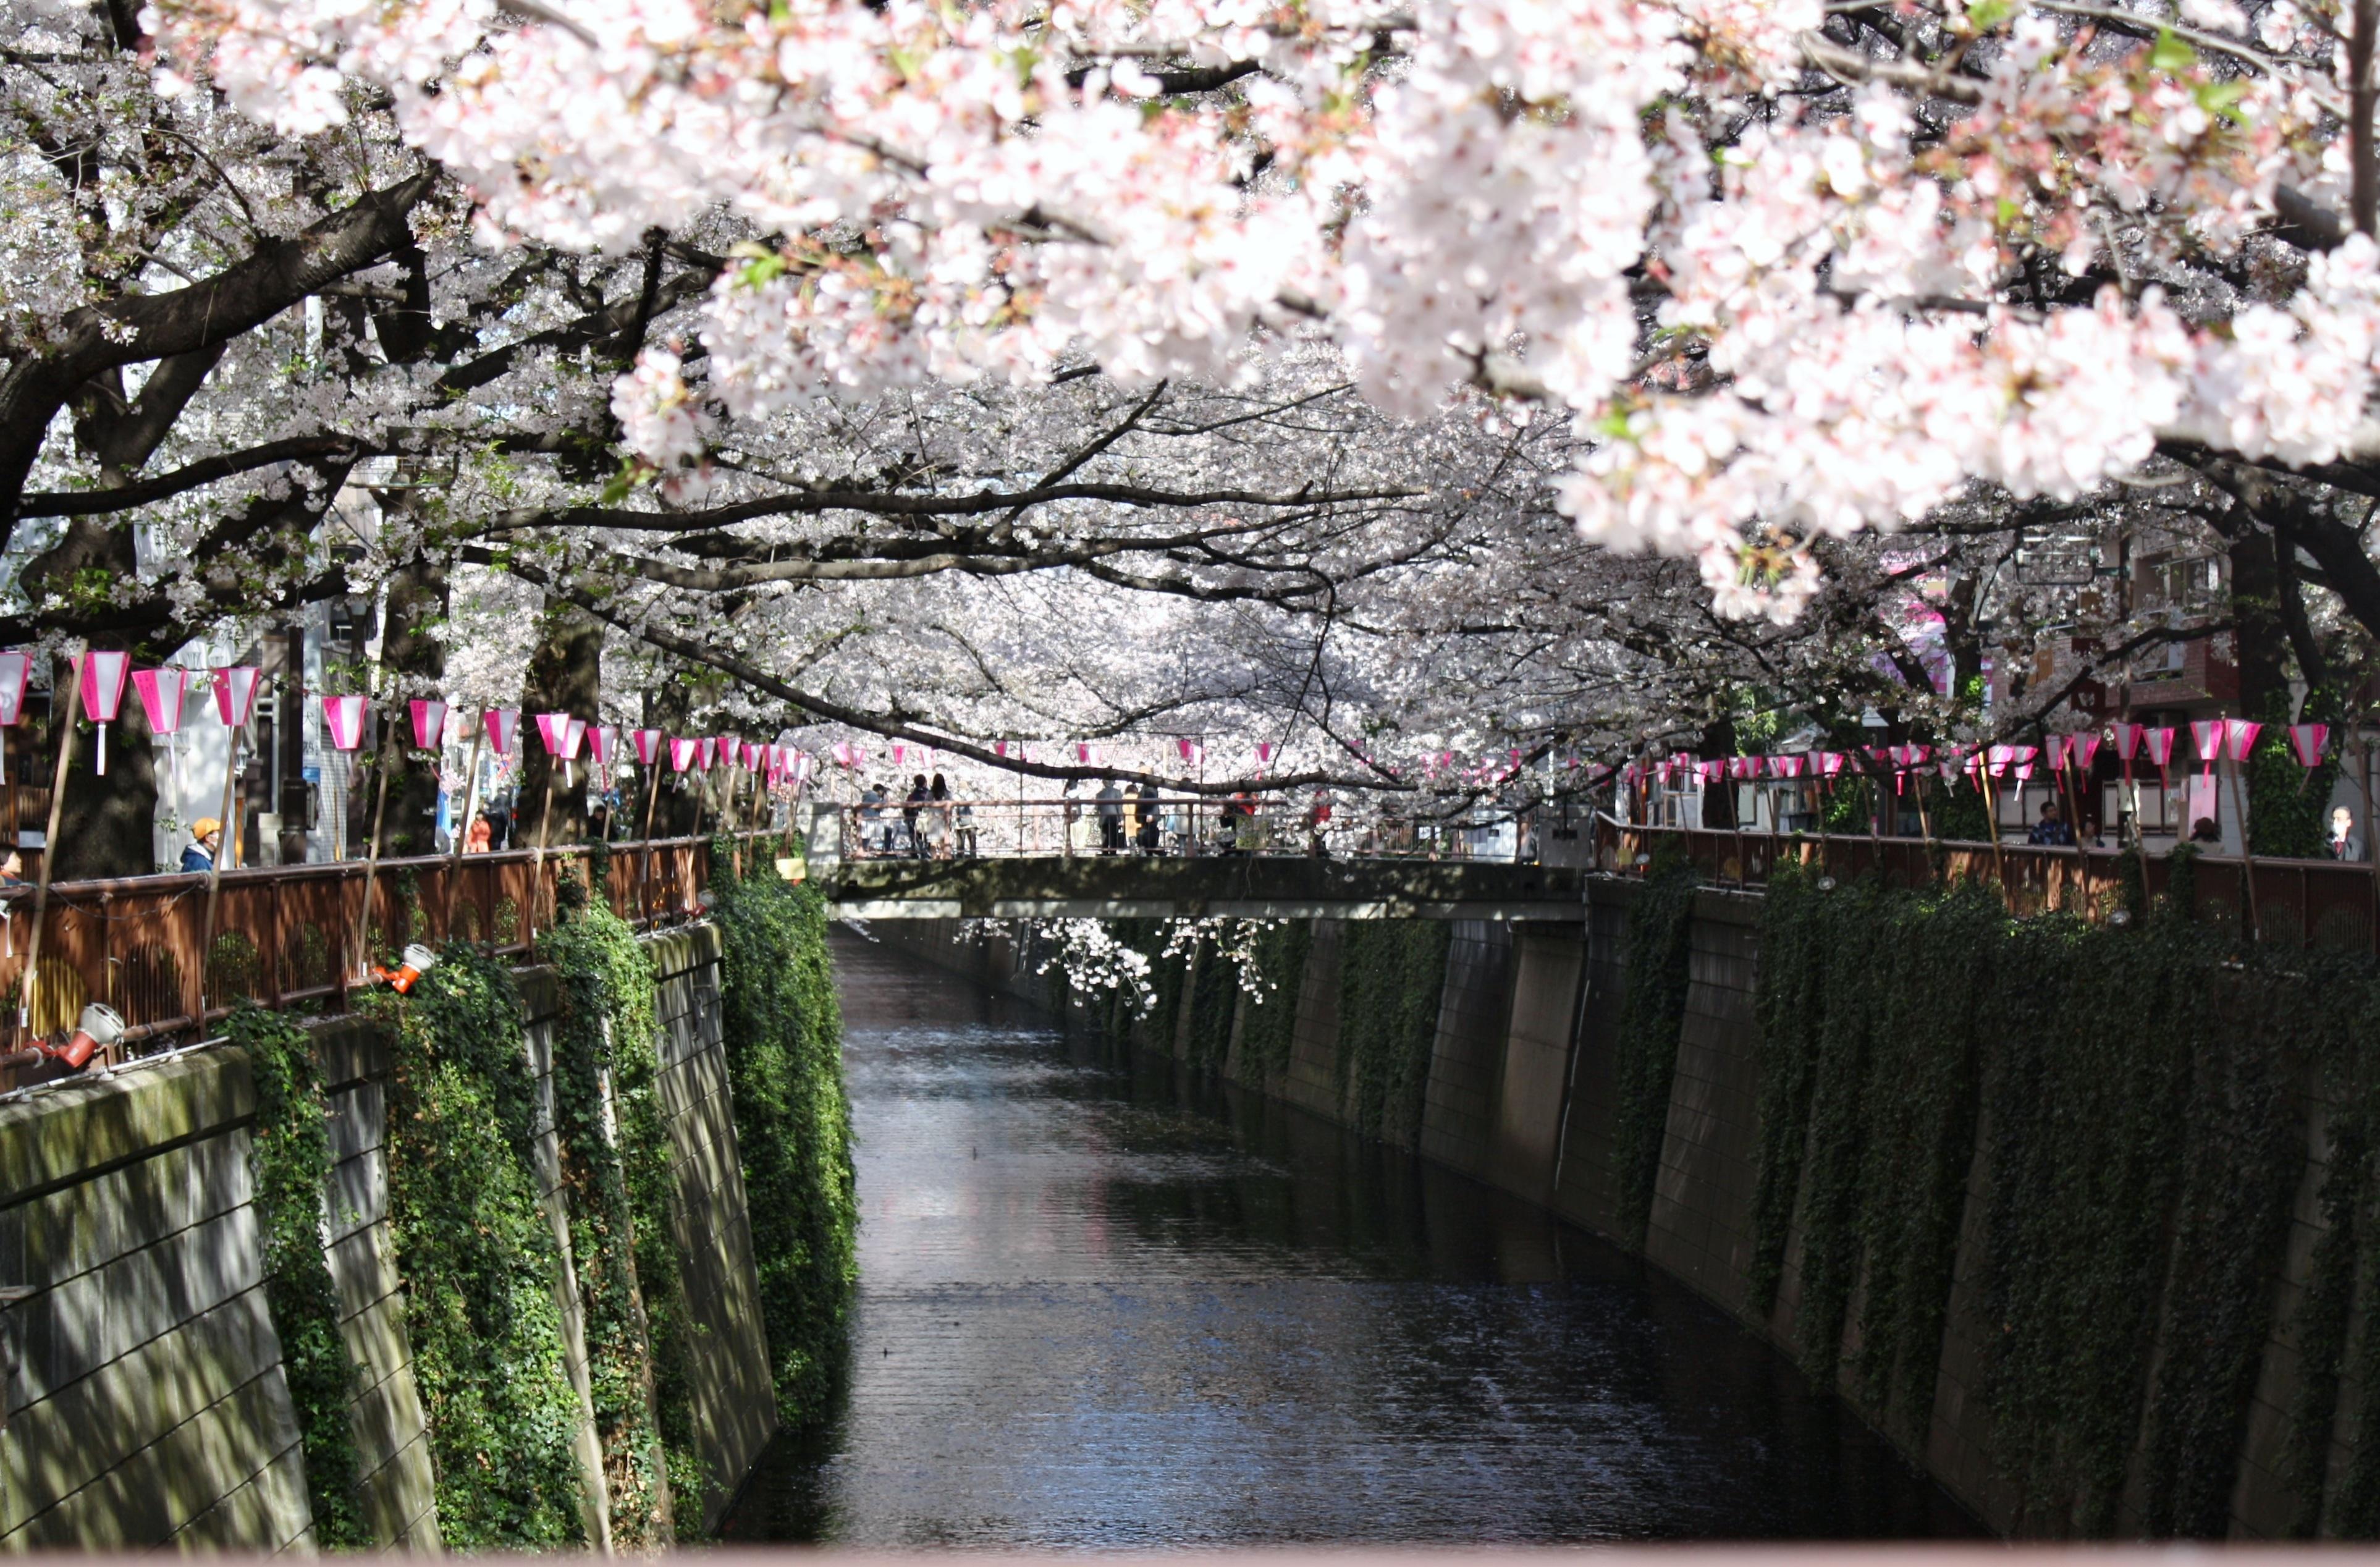 города сакура сена картинки это был